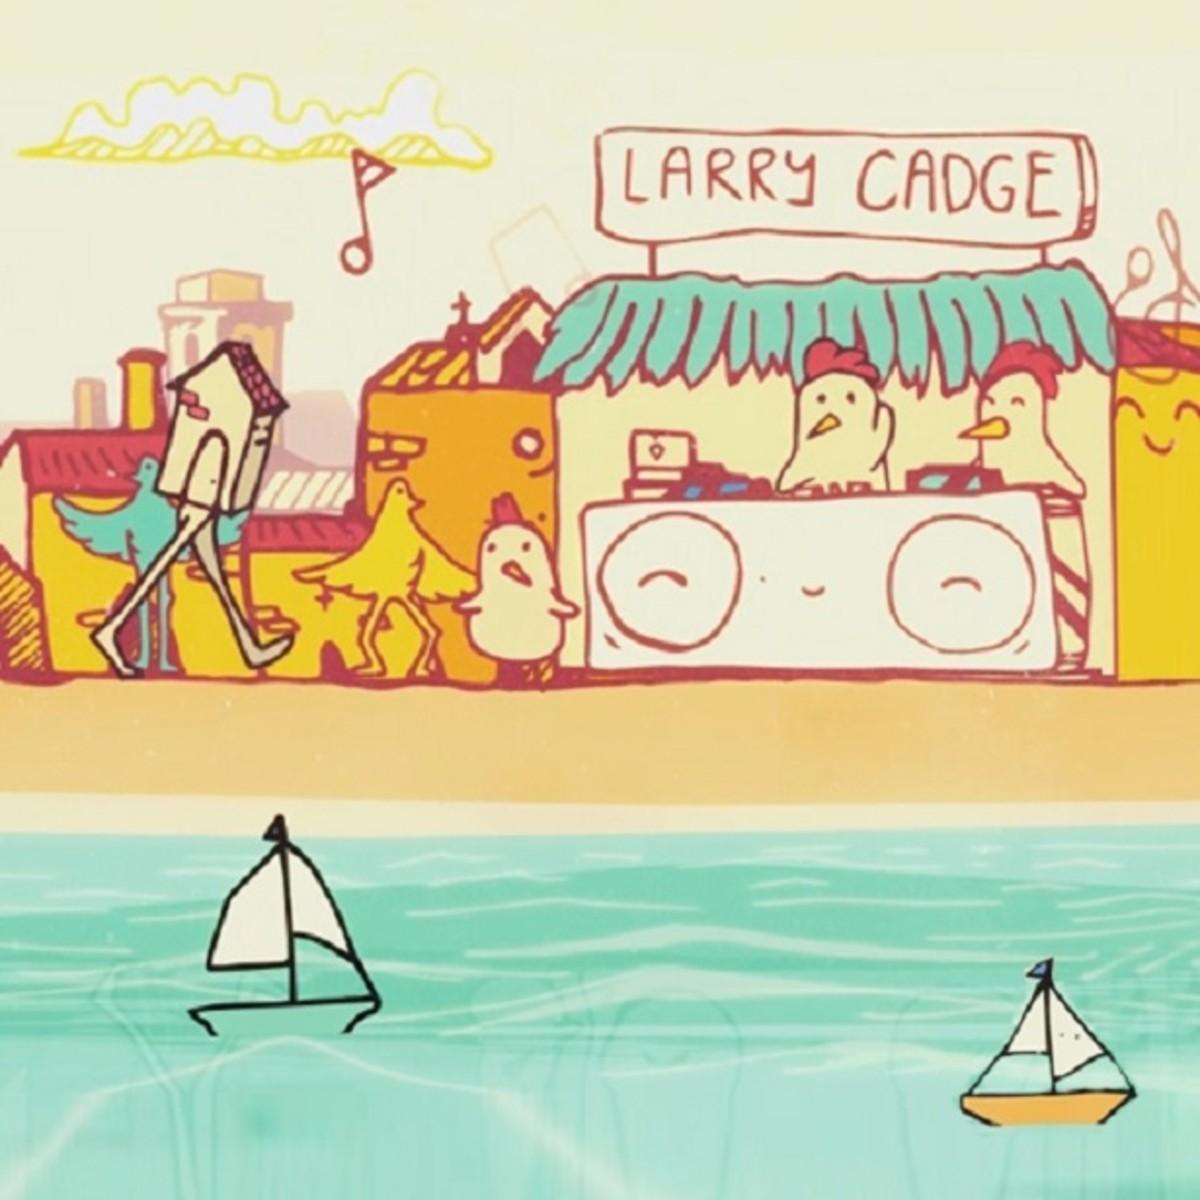 Larry Cadge - TOP 10